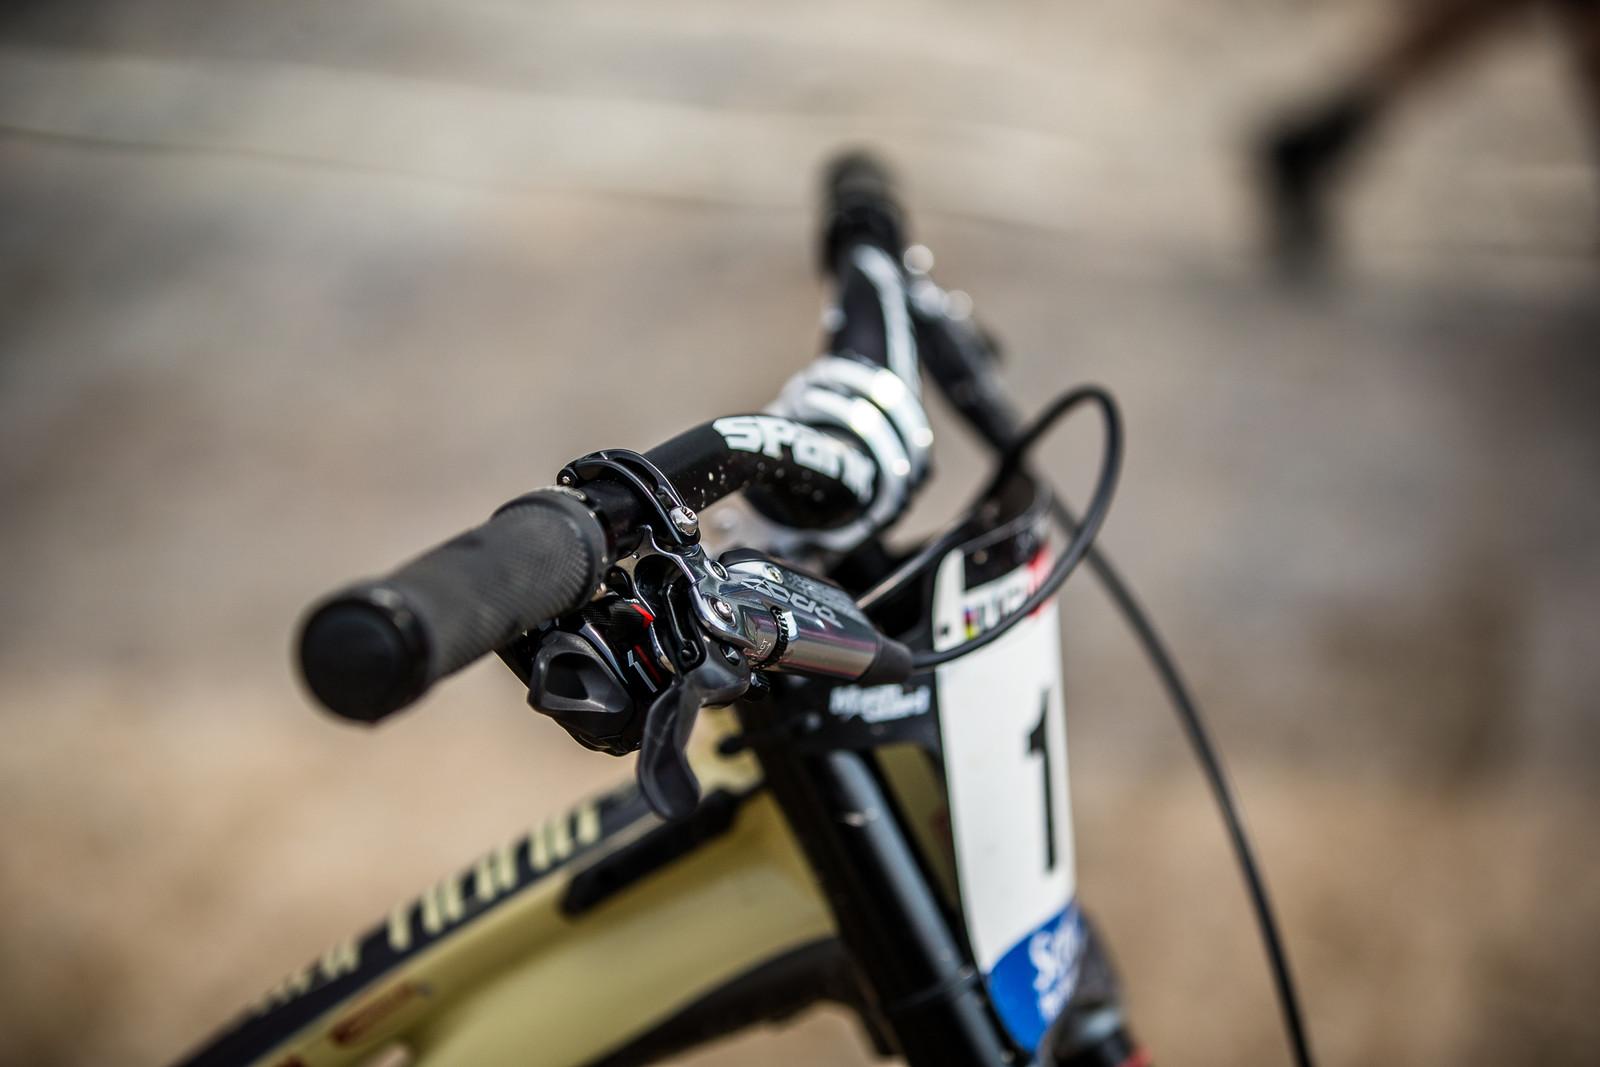 CODE Levers - WINNING BIKE - Amaury Pierron's Commencal Supreme DH 29 - Mountain Biking Pictures - Vital MTB